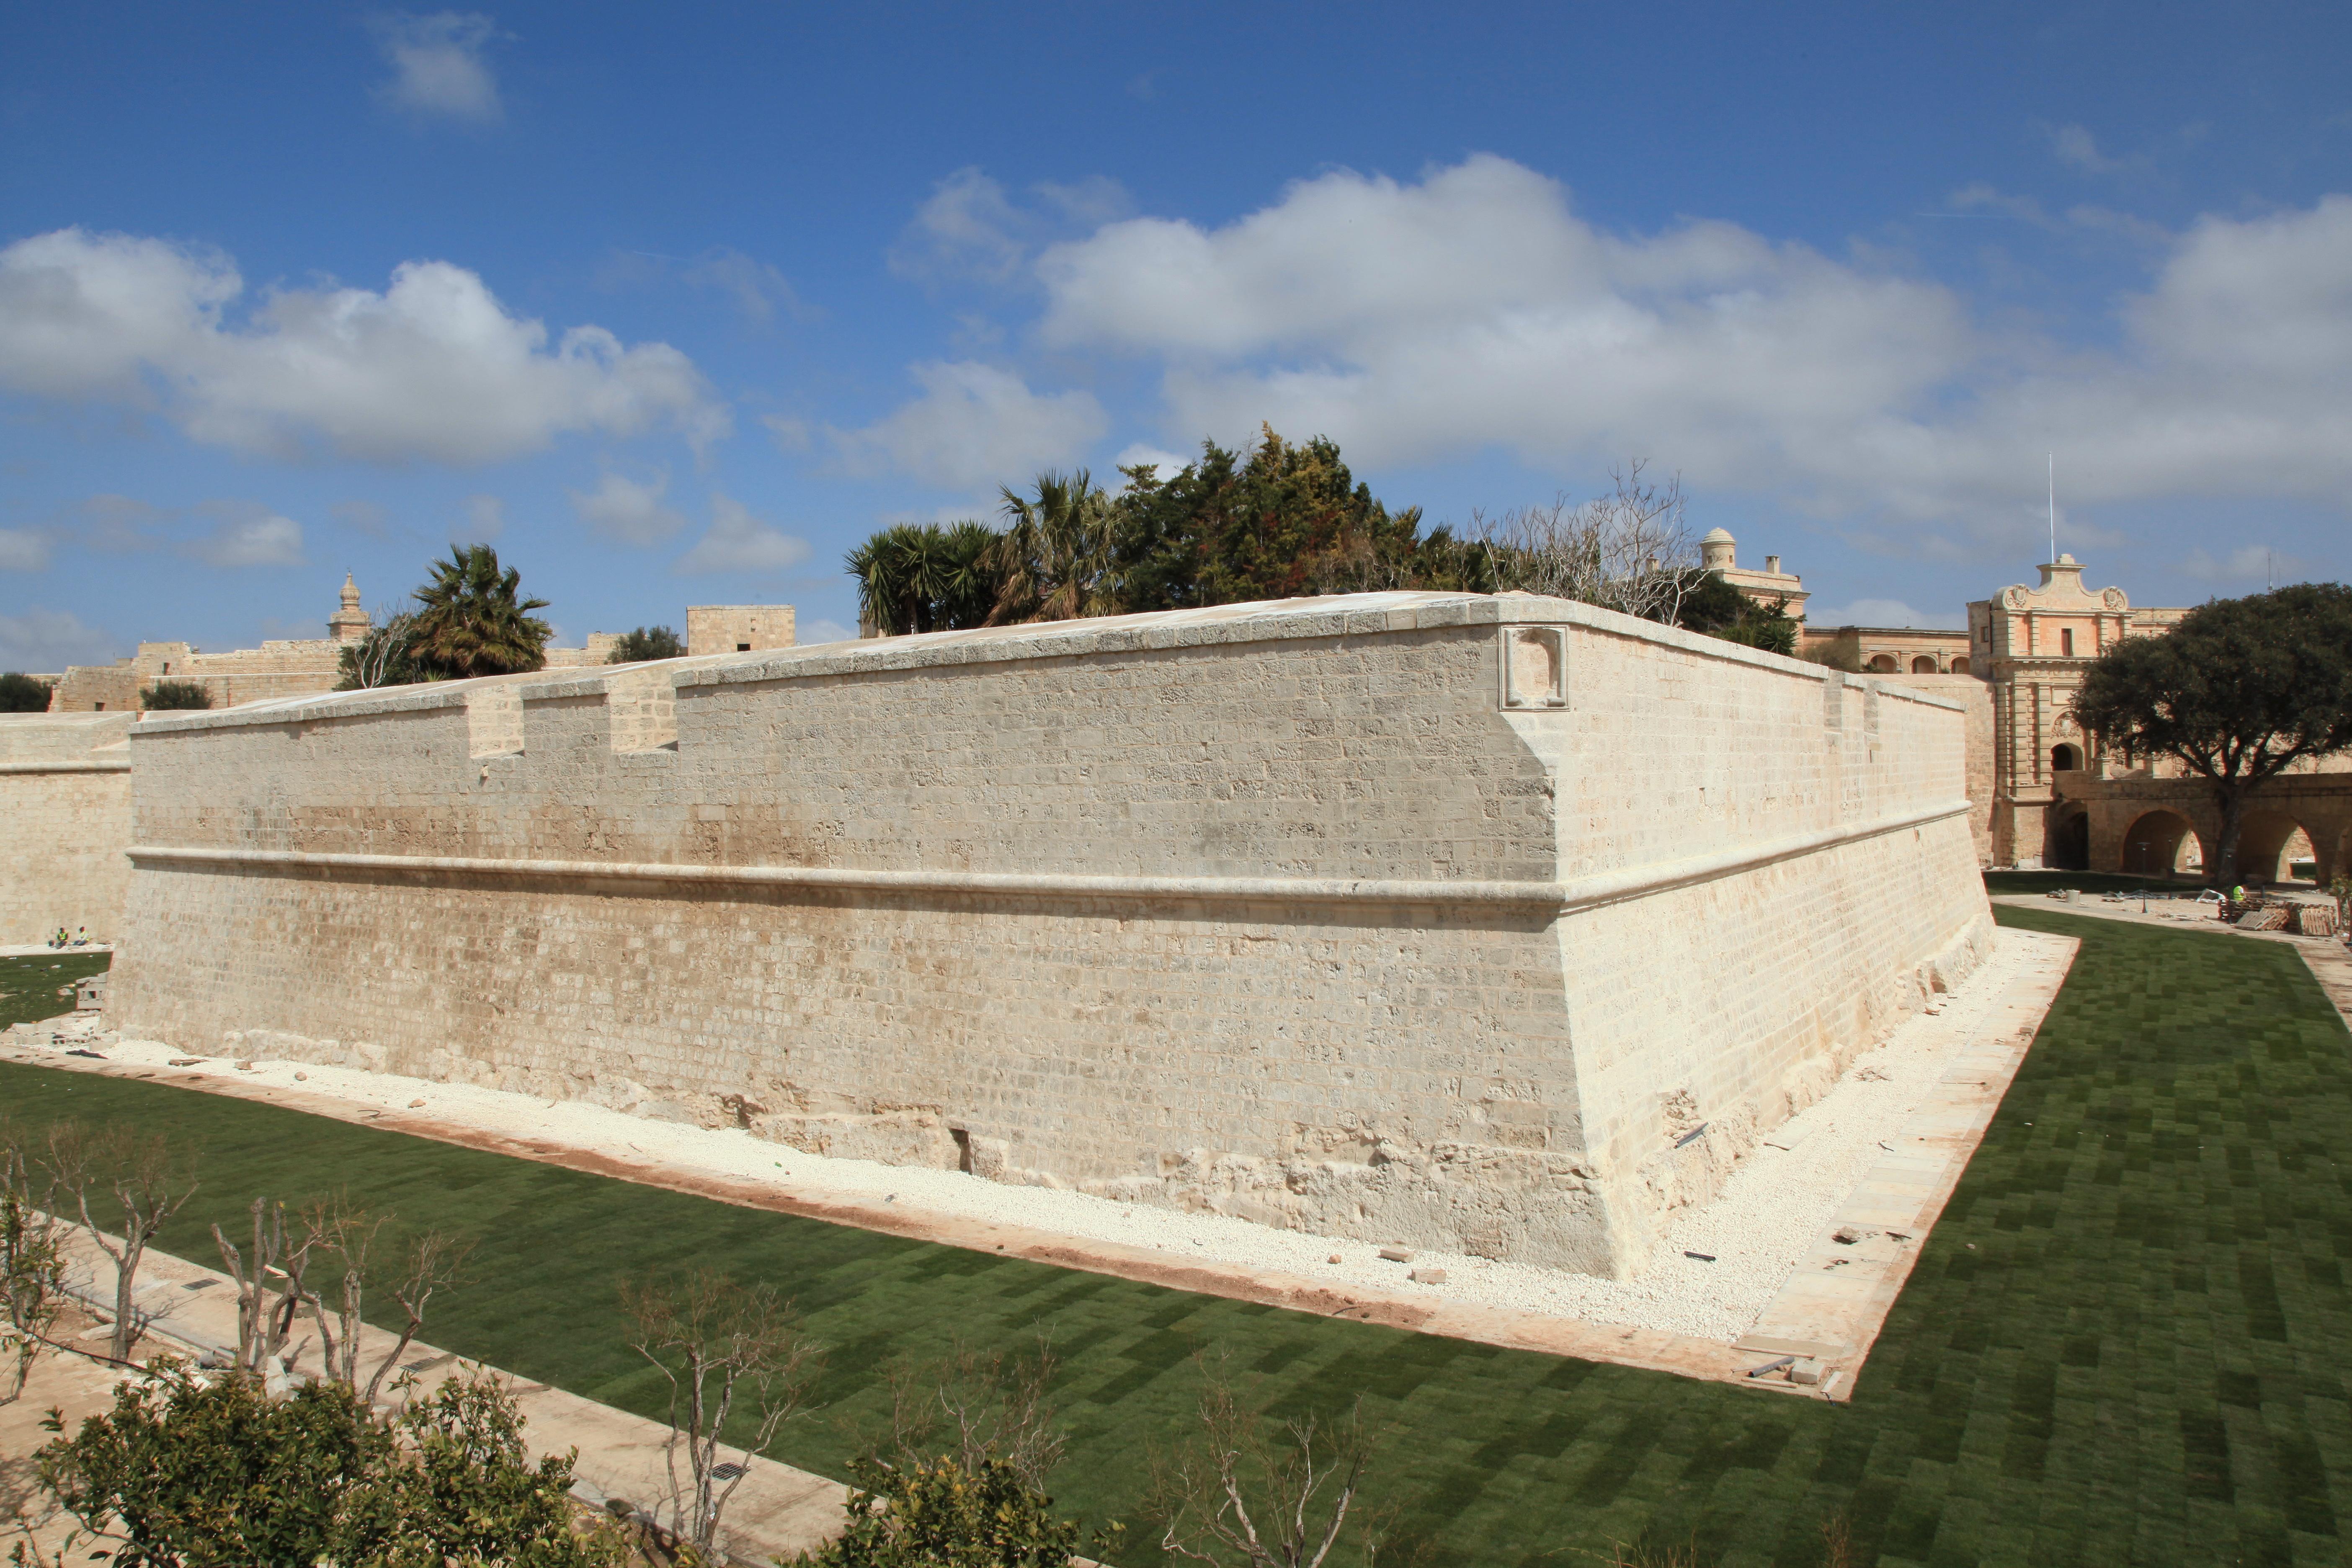 File:Malta - Mdina - City wall+ditch 01 ies.jpg ...